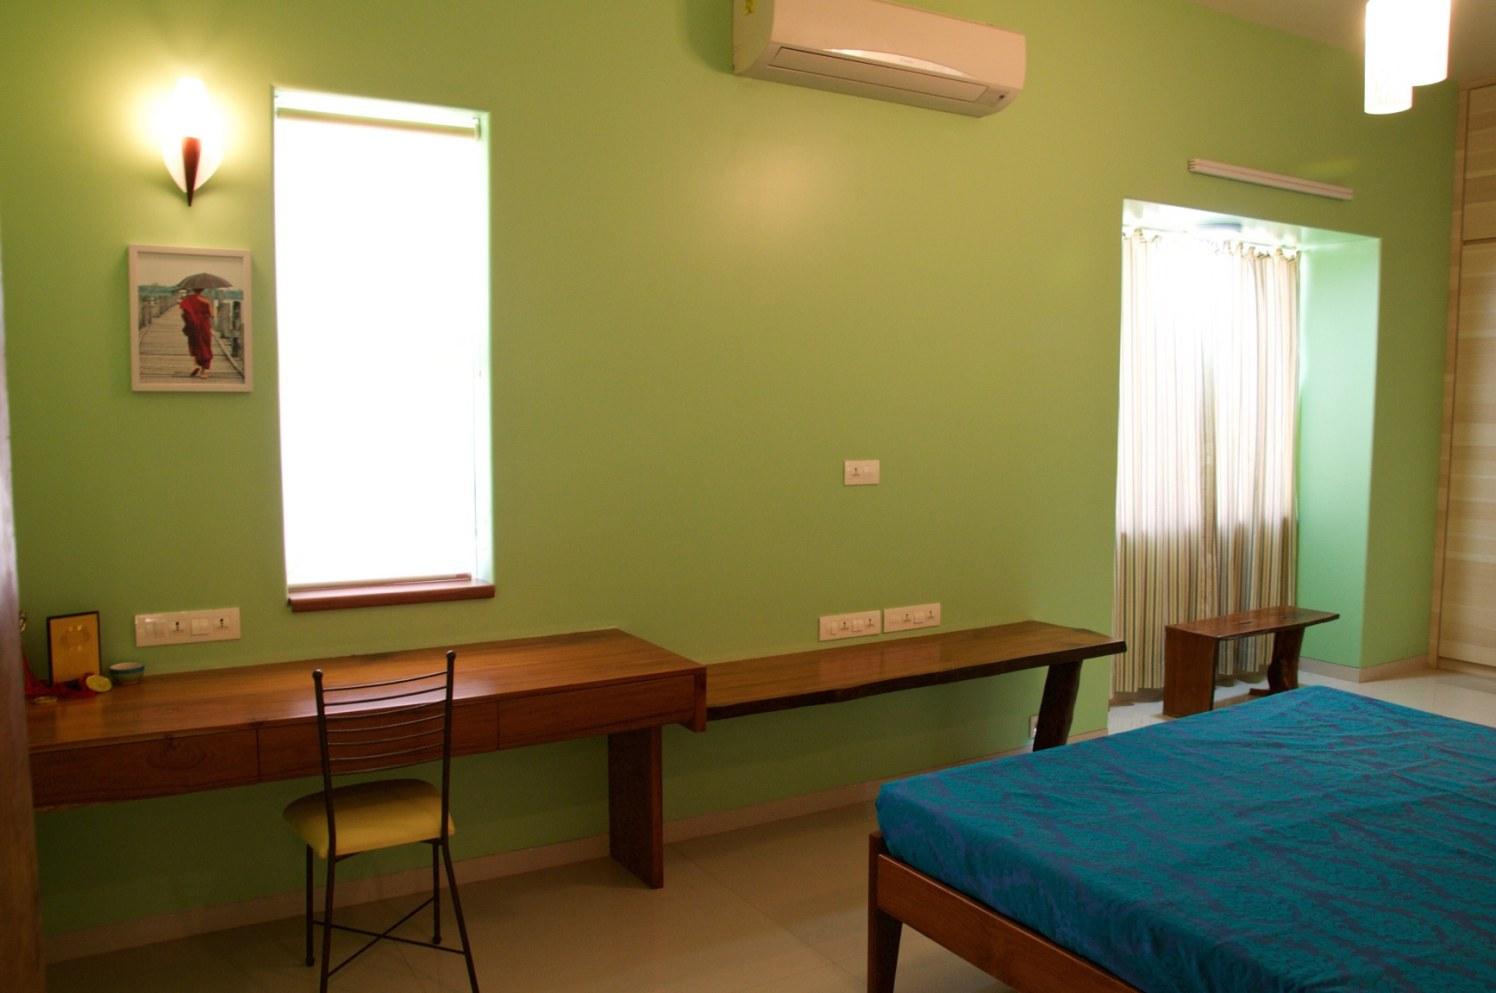 Simple Study Space In Guest Bedroom With Green Wall by Viraf Laskari  Bedroom Contemporary | Interior Design Photos & Ideas